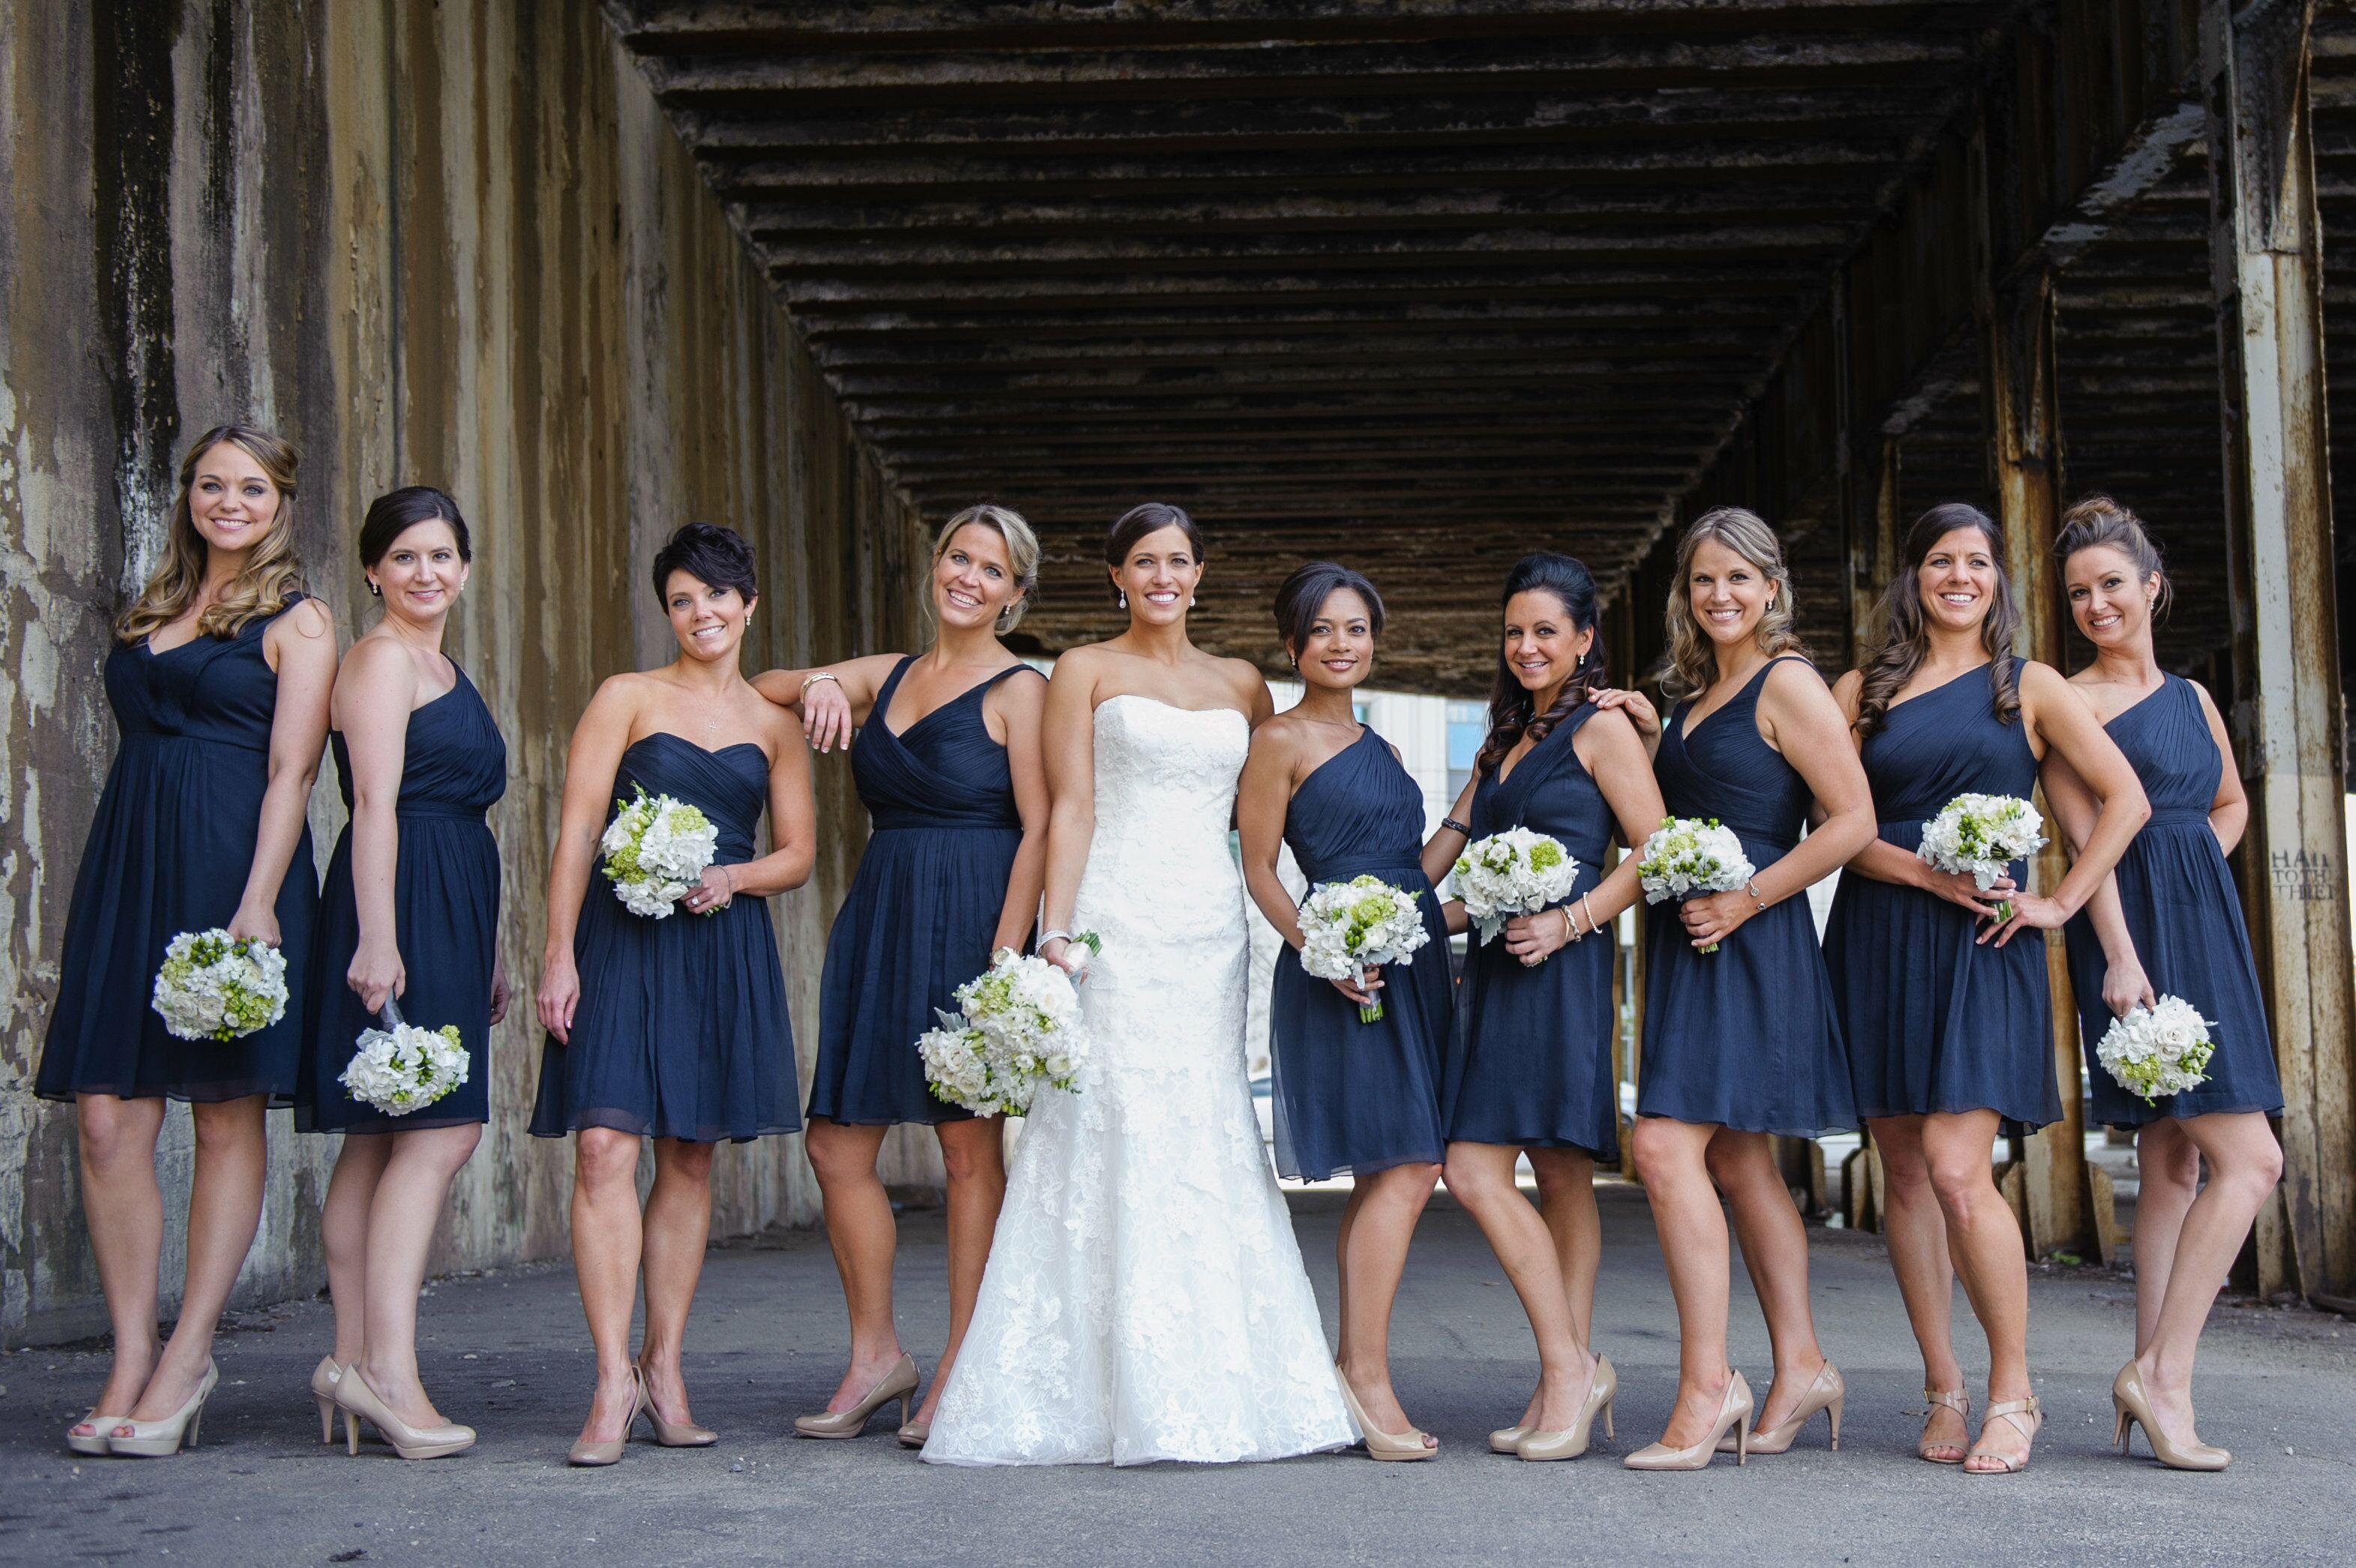 J.Crew Navy Chiffon Bridesmaid Dresses